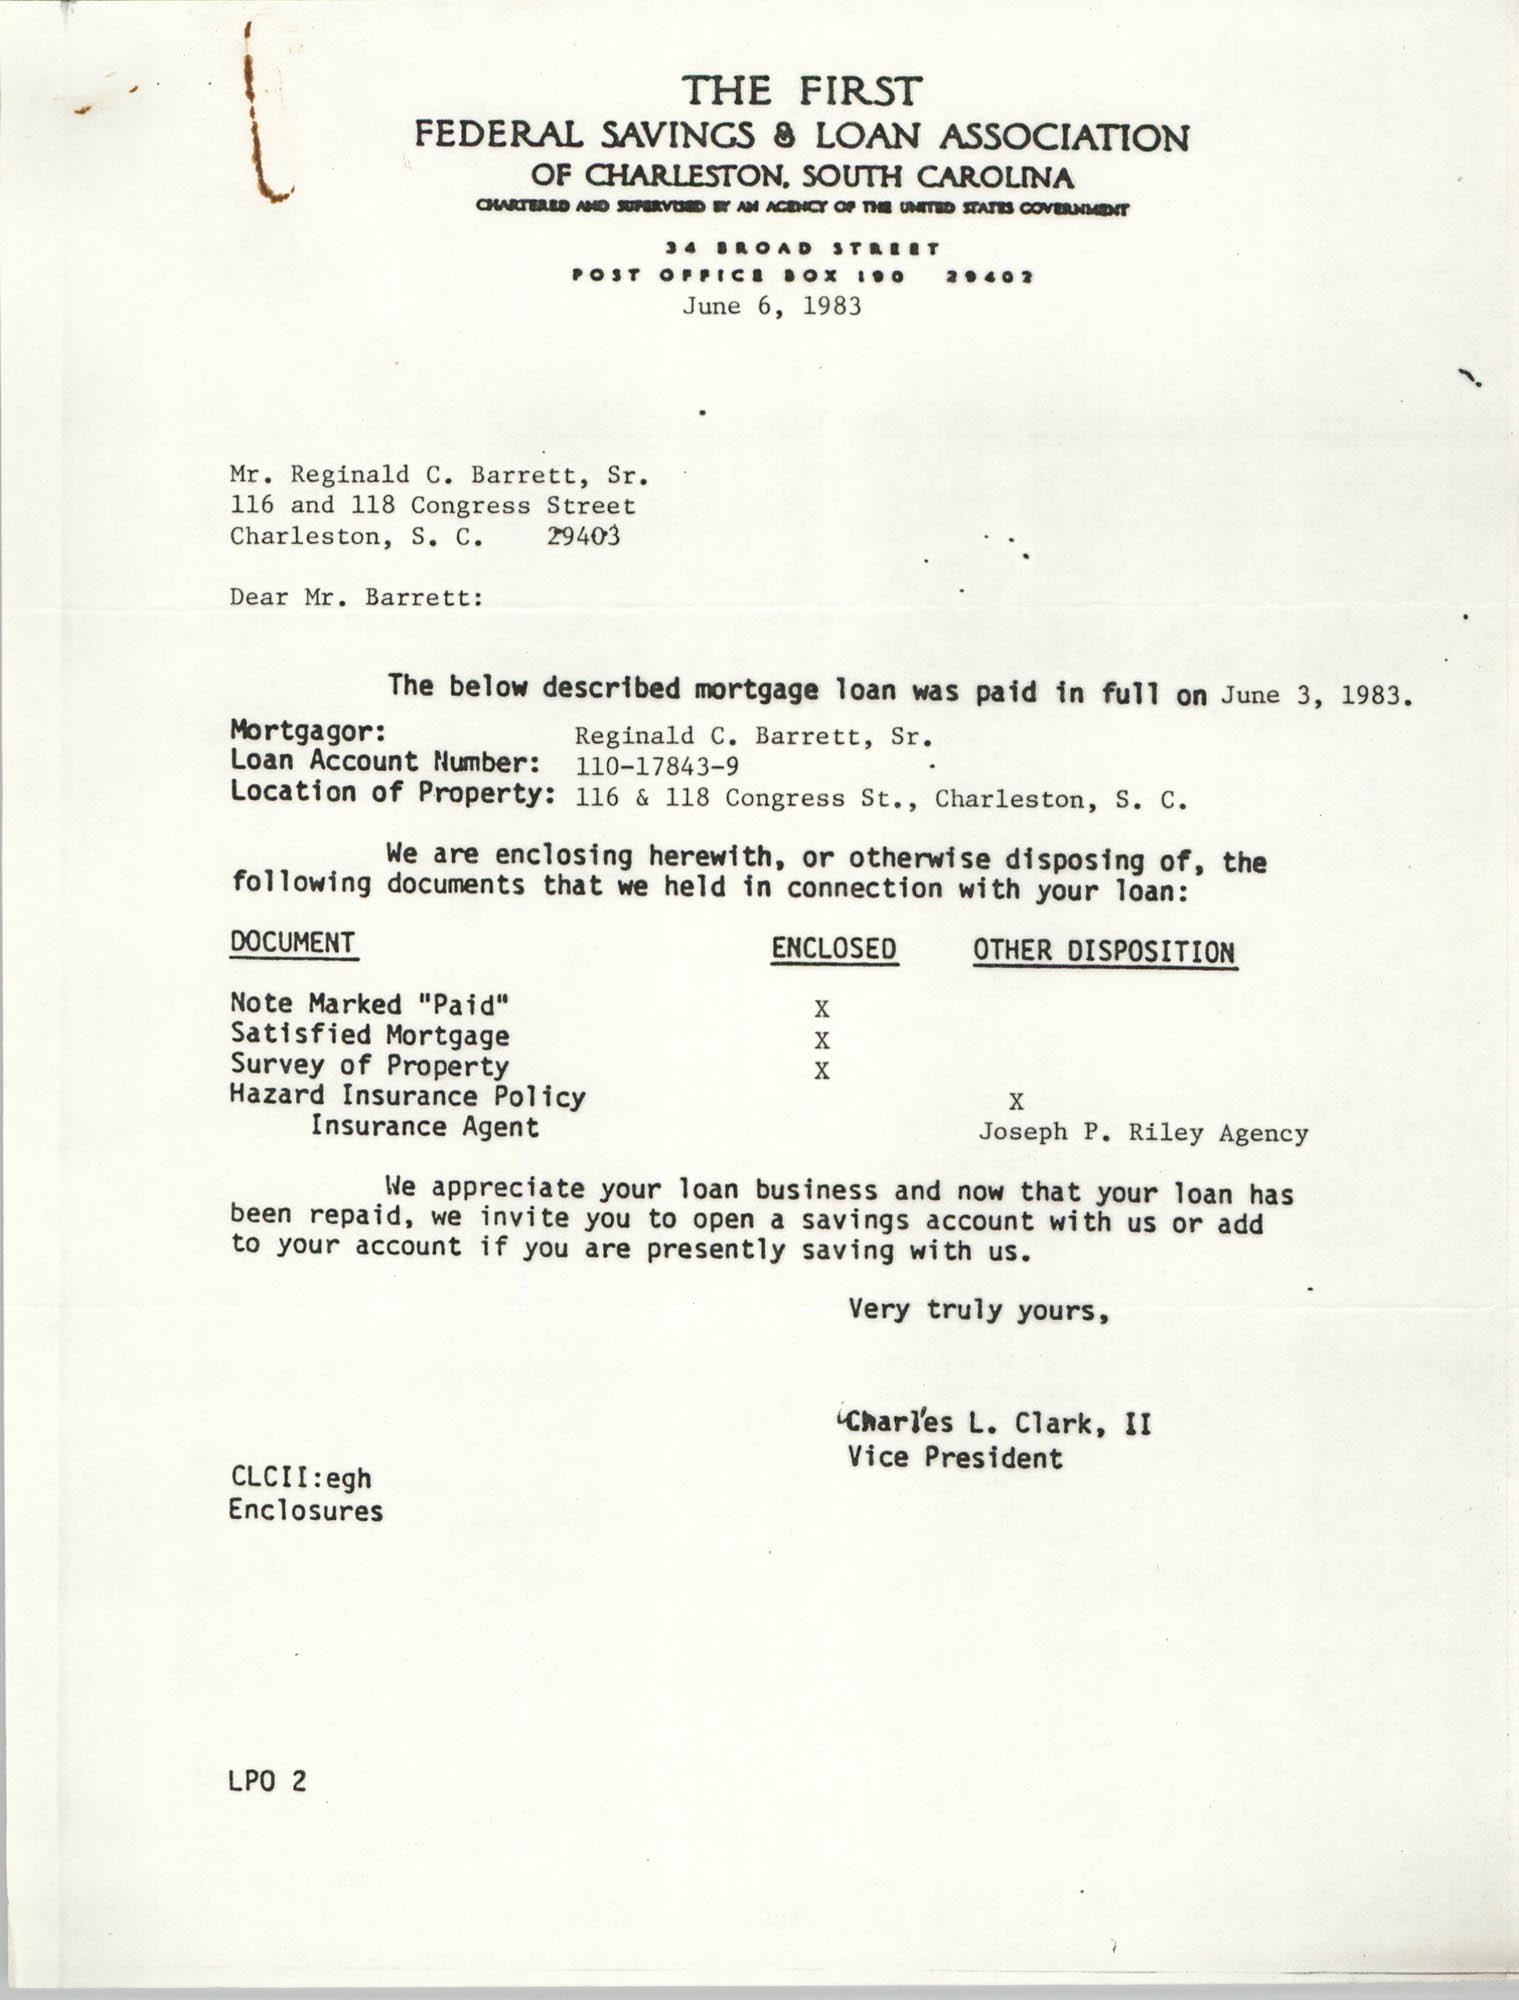 Letter from Charles L. Clark II to Reginald C. Barrett, Sr., June 6, 1983